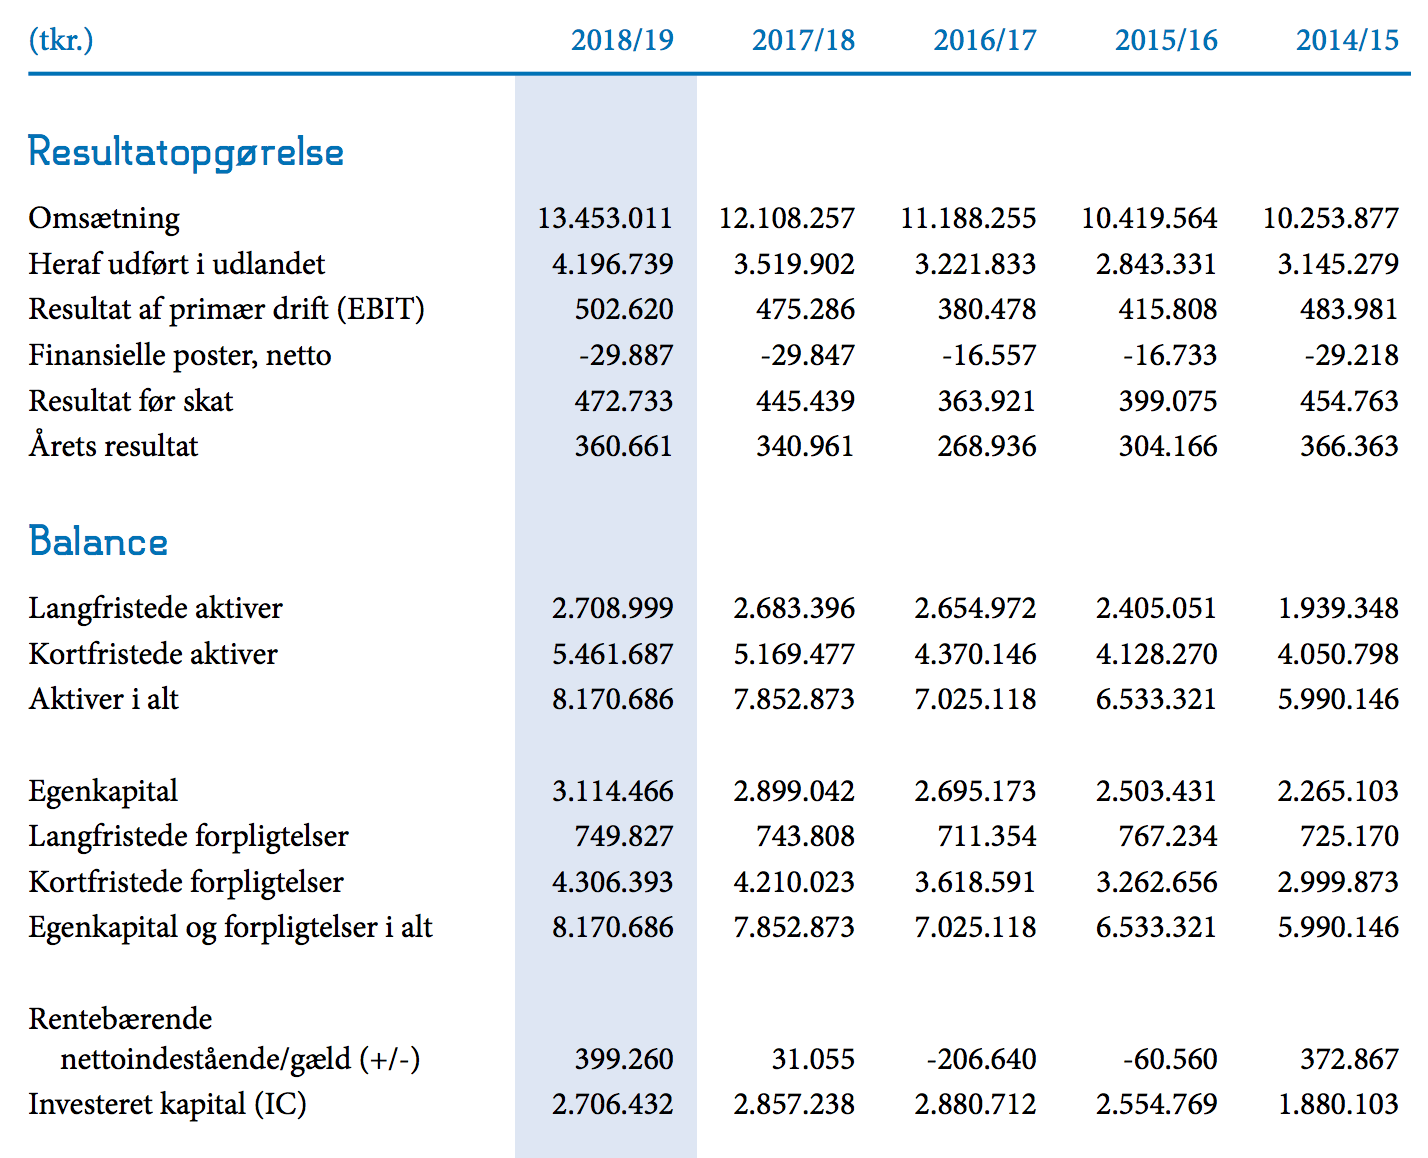 Kilde og tabel: Per Aarsleff Holding A/S' regnskab 2018/19